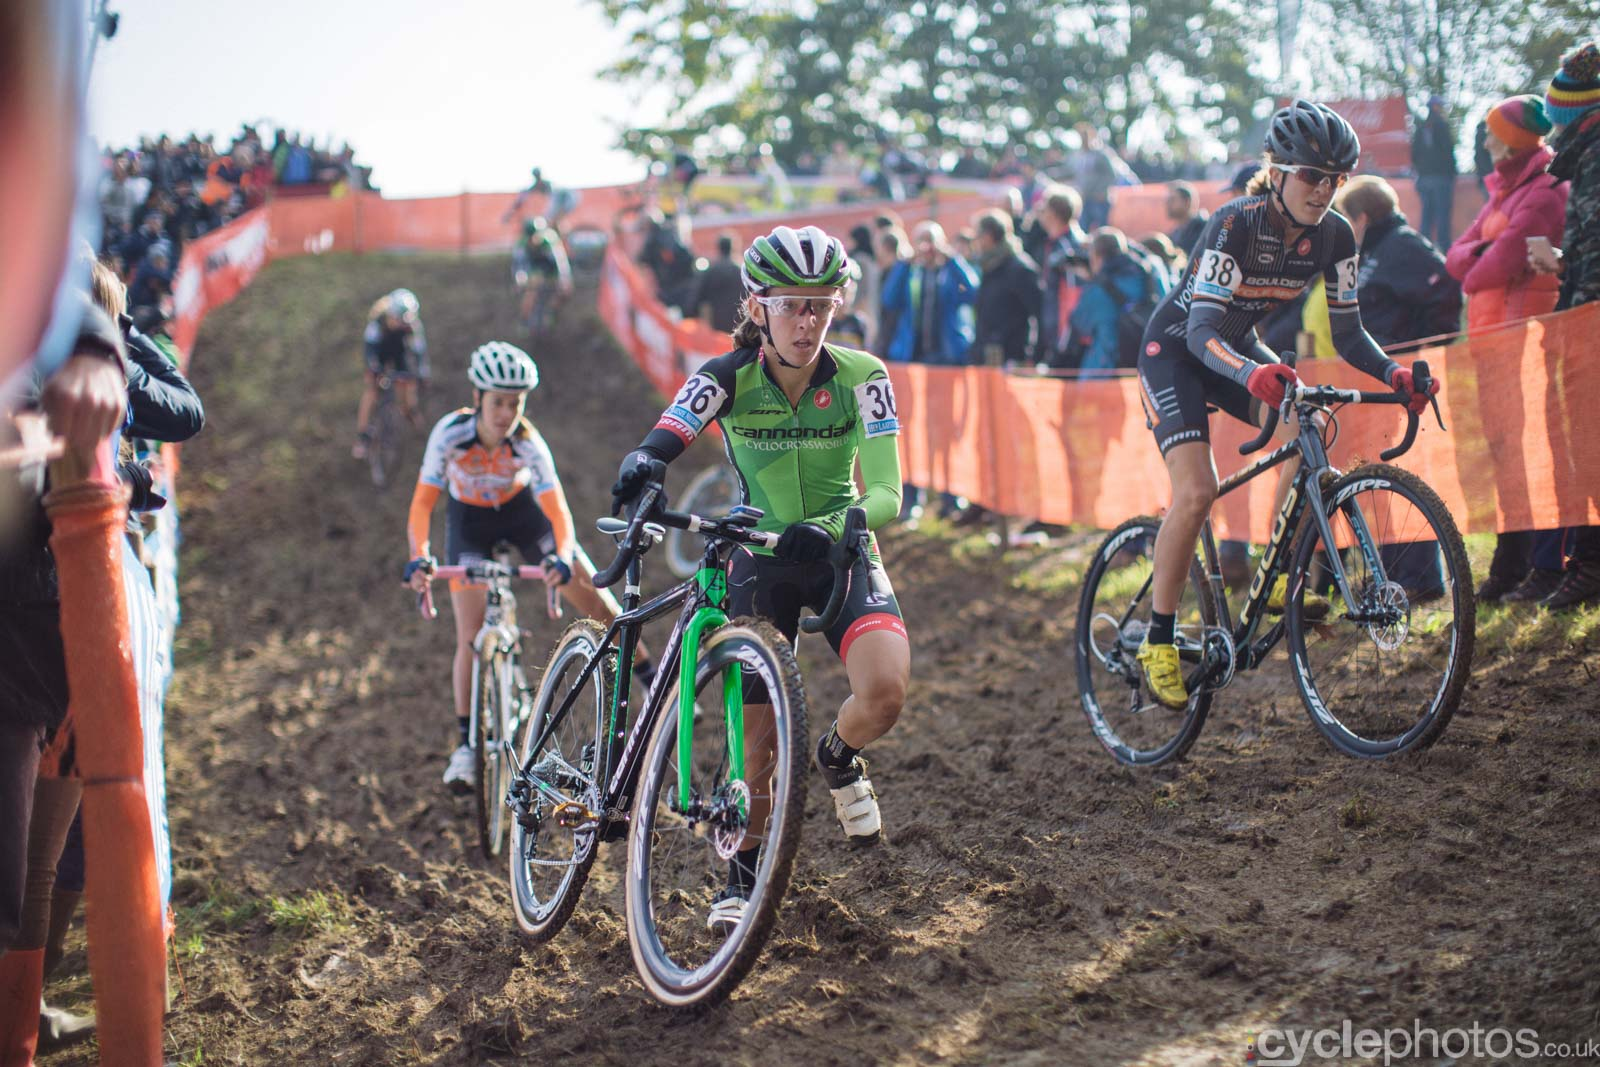 2015-cyclephotos-cyclocross-valkenburg-133217-kaitie-antonneau